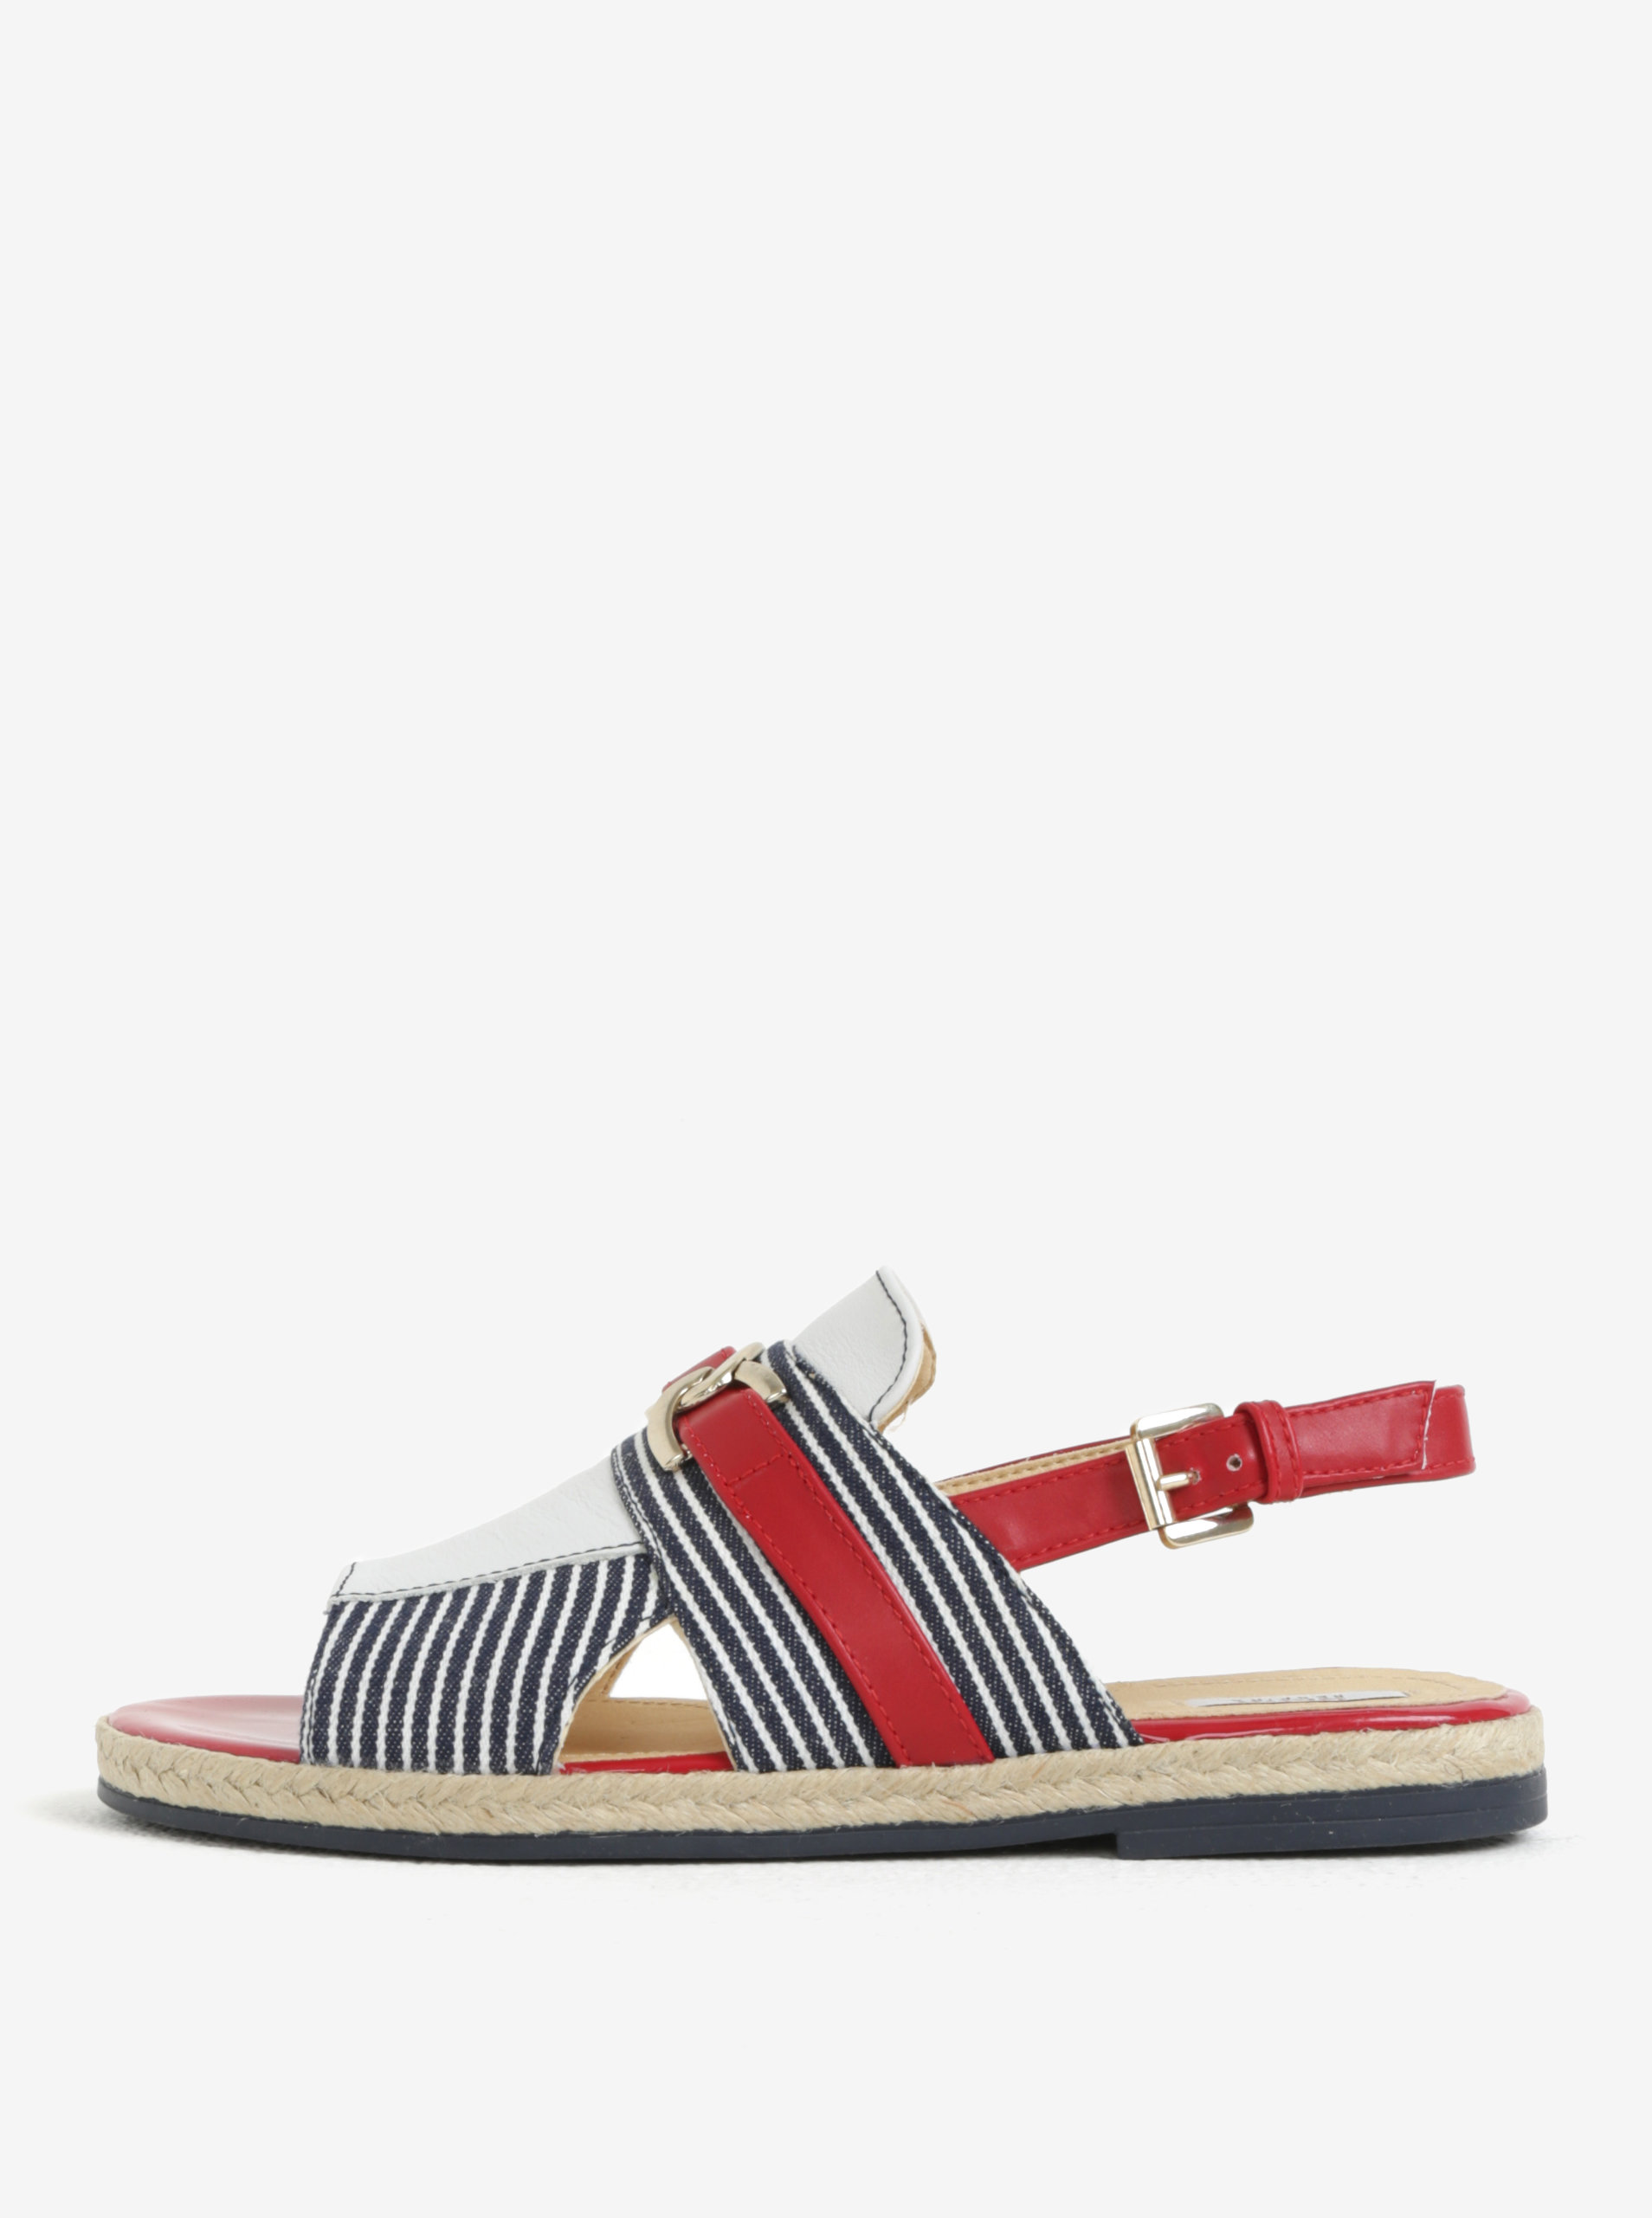 Červeno-modré dámské sandály Geox Mary Kolleen ... 8834e08b5b